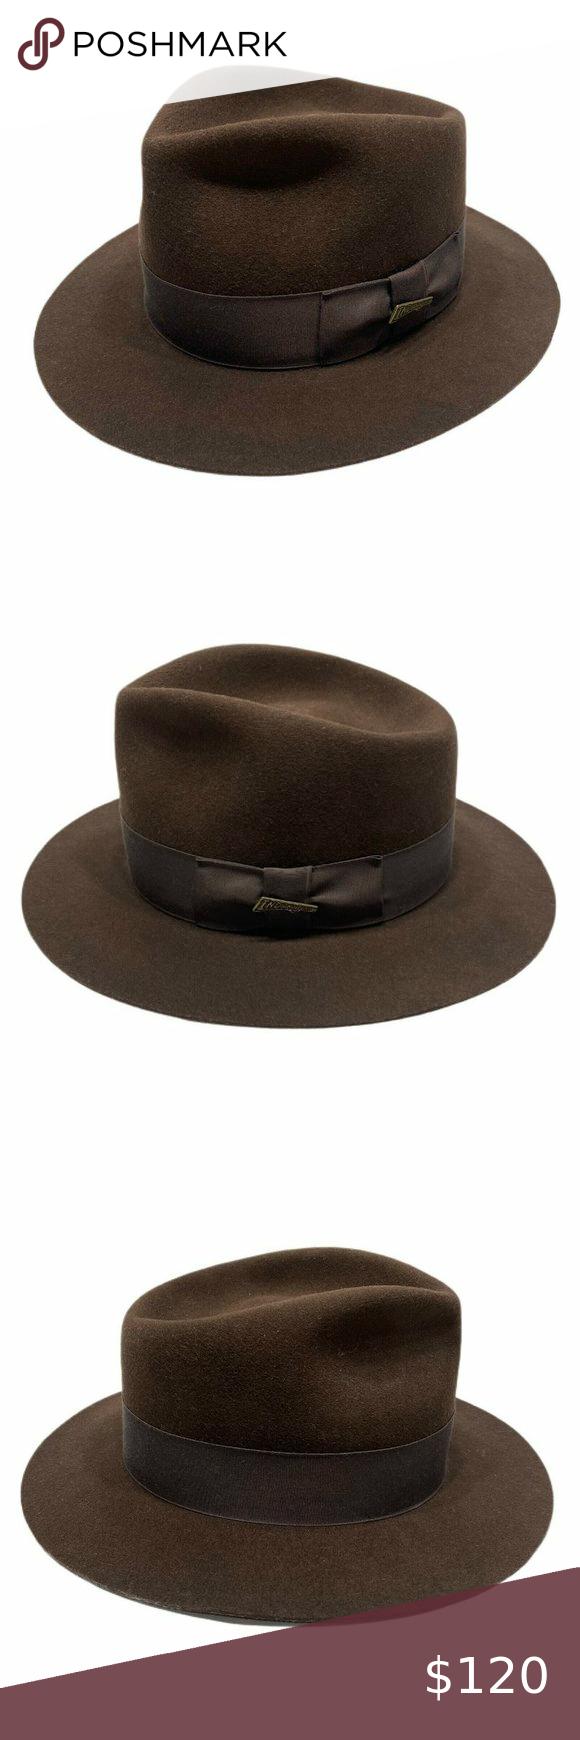 1984 Indiana Jones Stetson Fedora Promo Hat Pin Vintage 1984 Indiana Jones Brown Stetson Fedora Promo Hat Pin Rare To Find Th Stetson Fedora Stetson Fedora